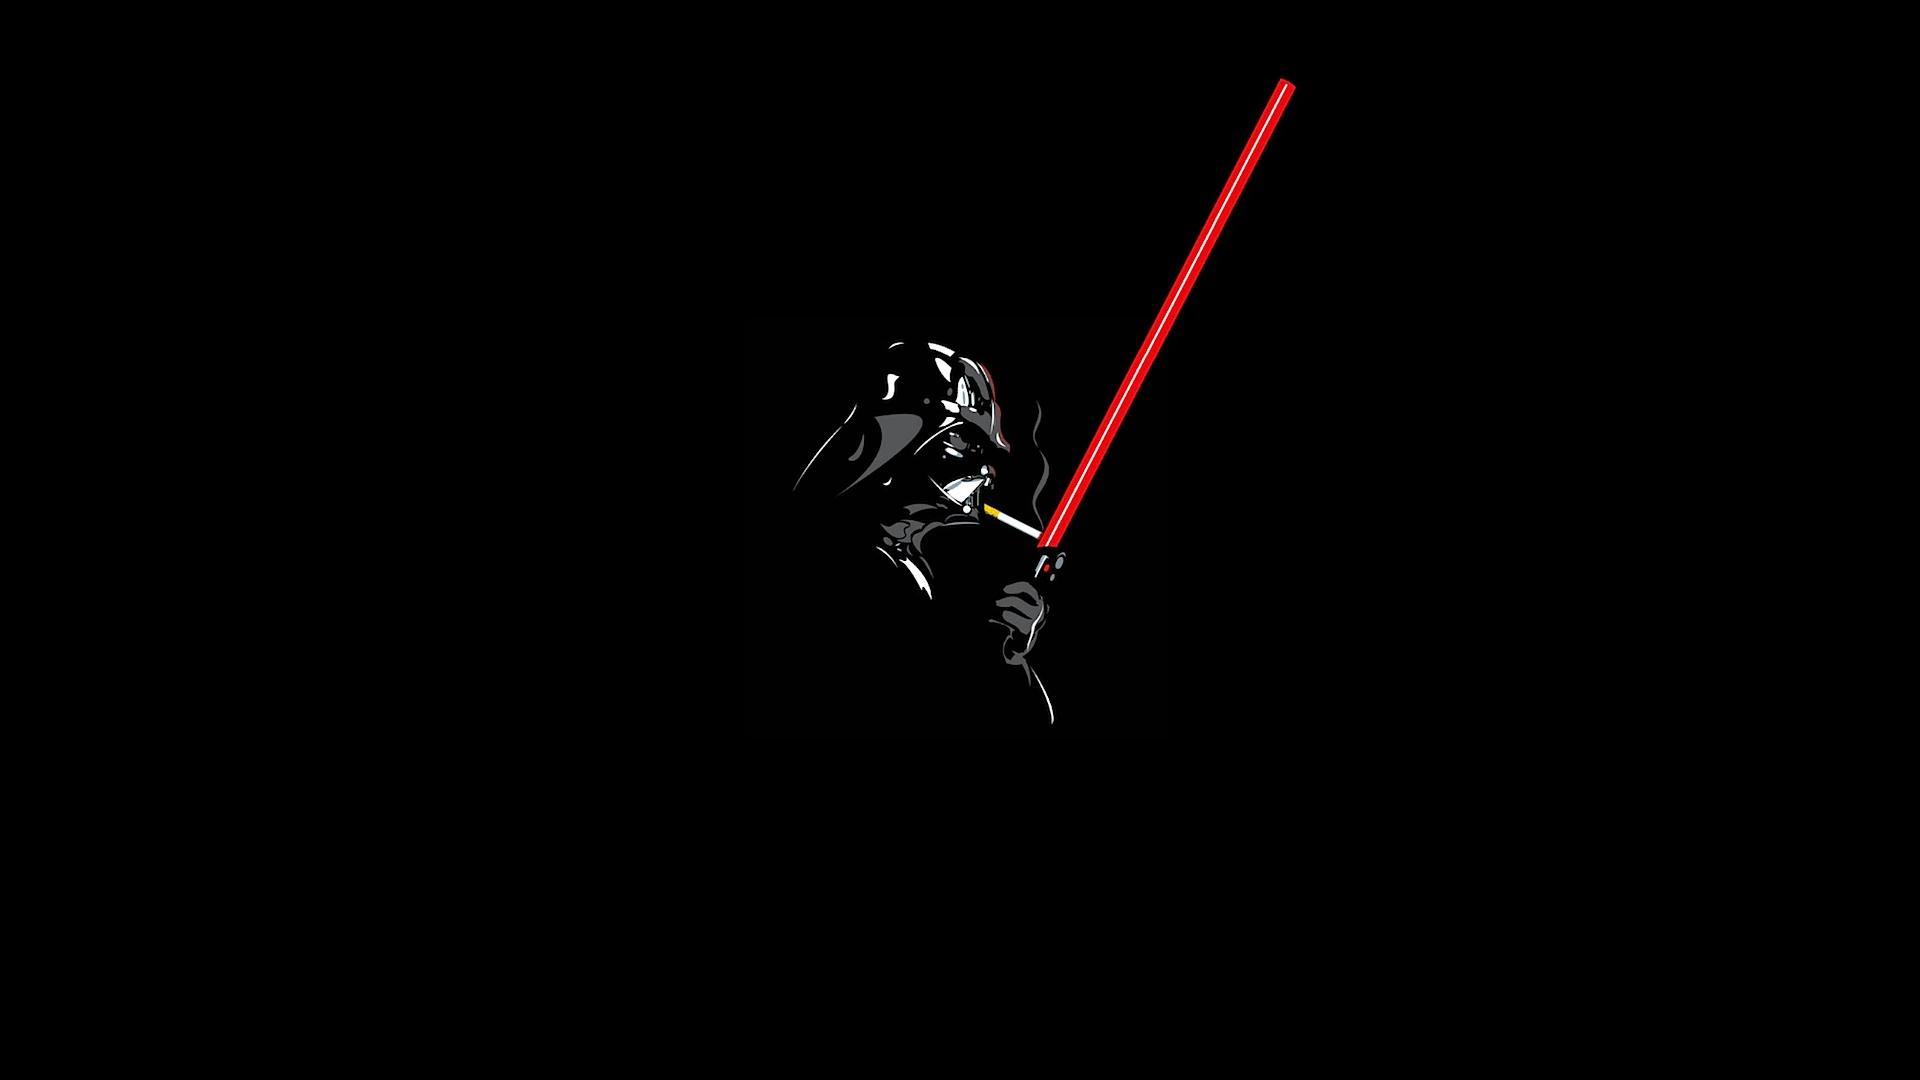 General 1920x1080 Darth Vader lightsaber smoking Star Wars humor cigarettes black minimalism Sith Star Wars Villains black background